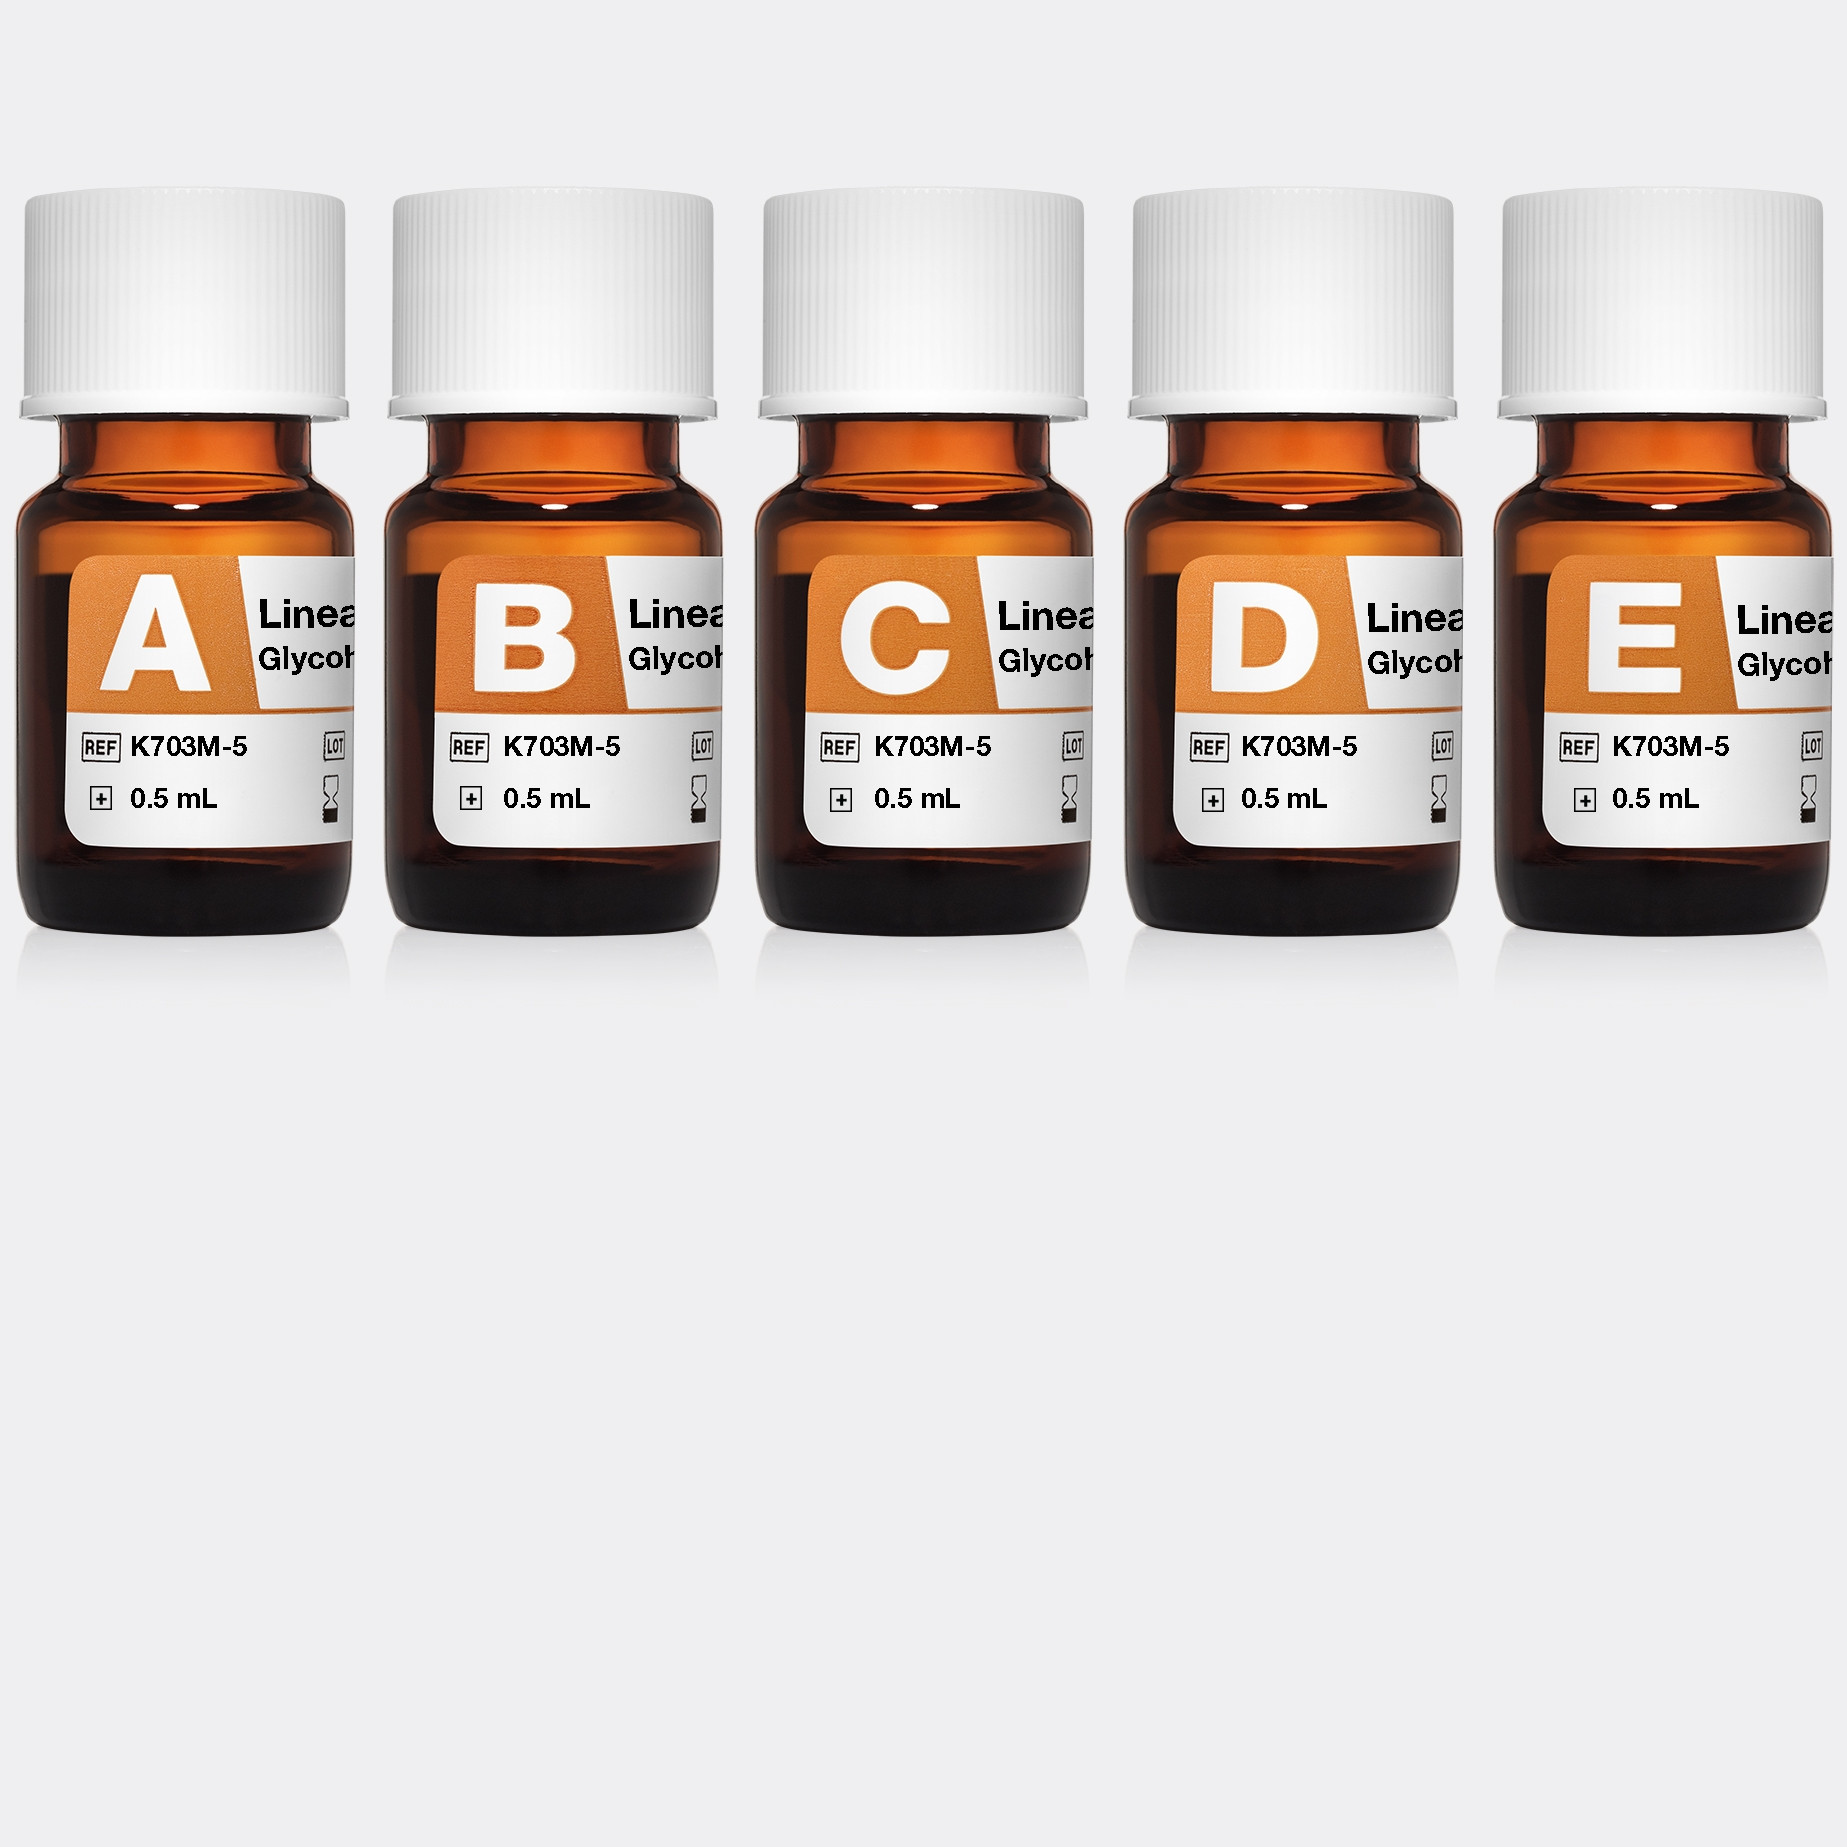 Linearity FD Glycohemoglobin A1c